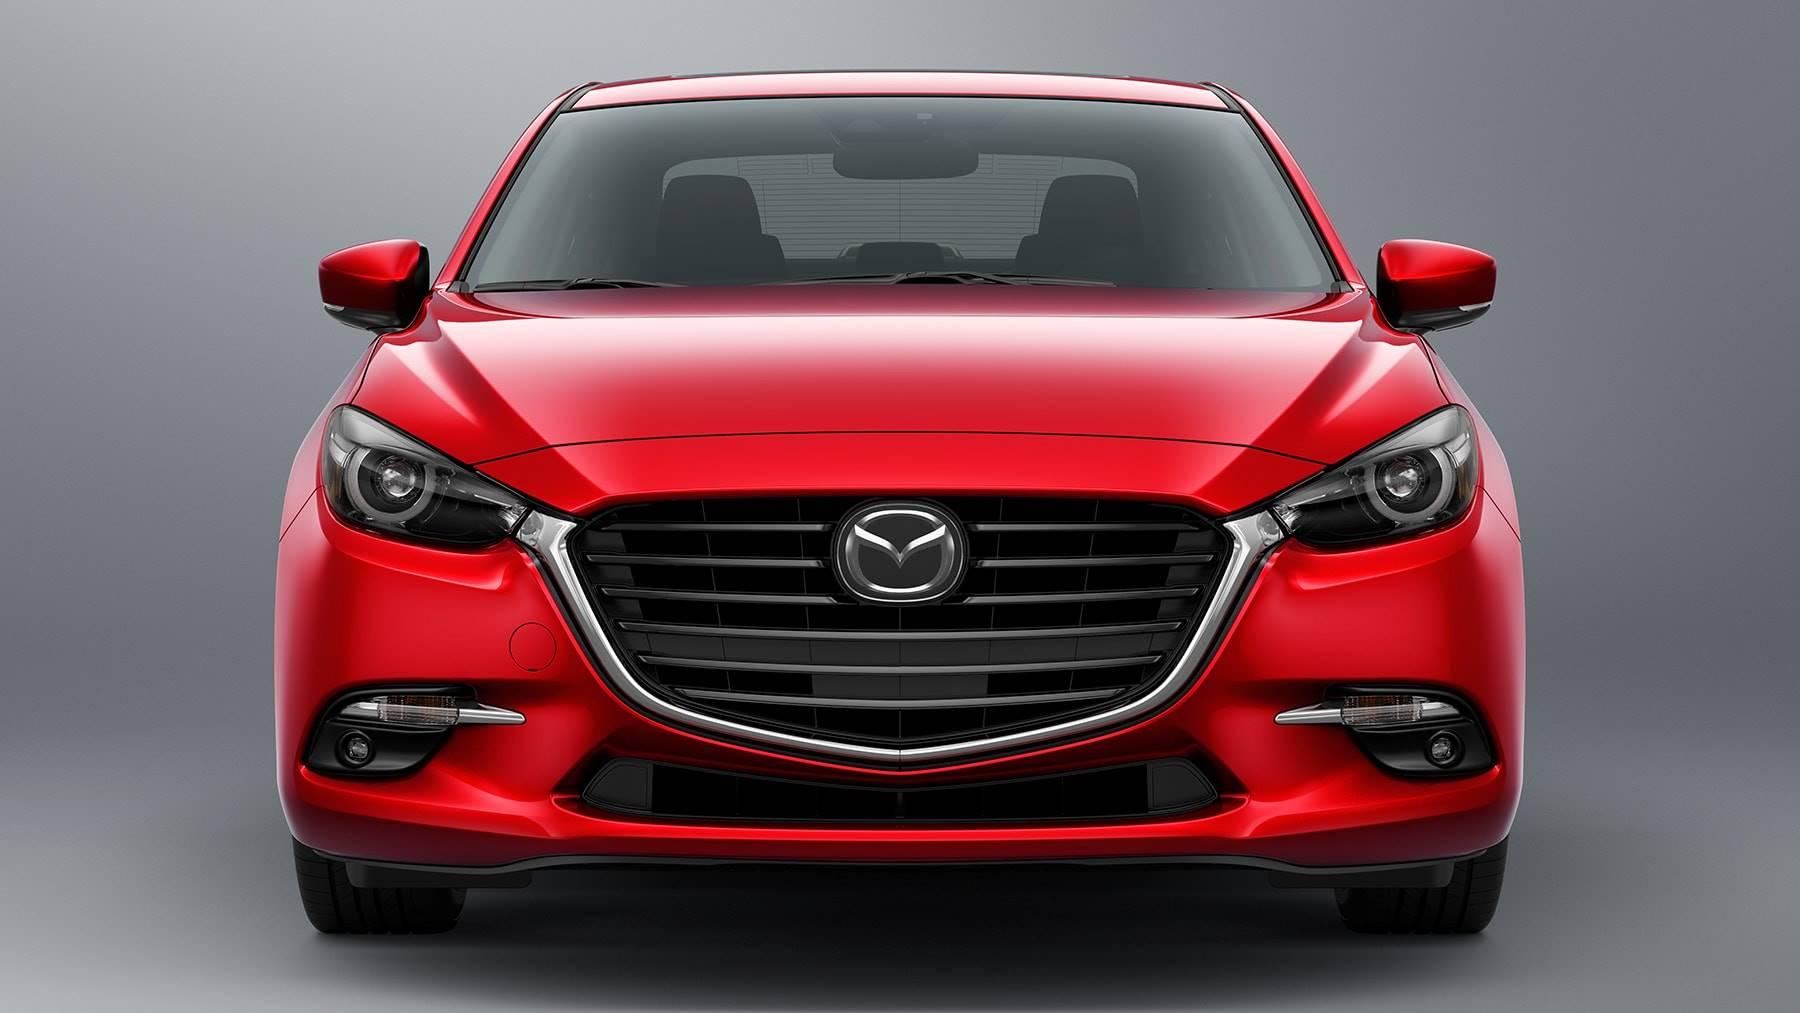 2017 Mazda3 Vs 2017 Ford Focus Near La Porte, TX